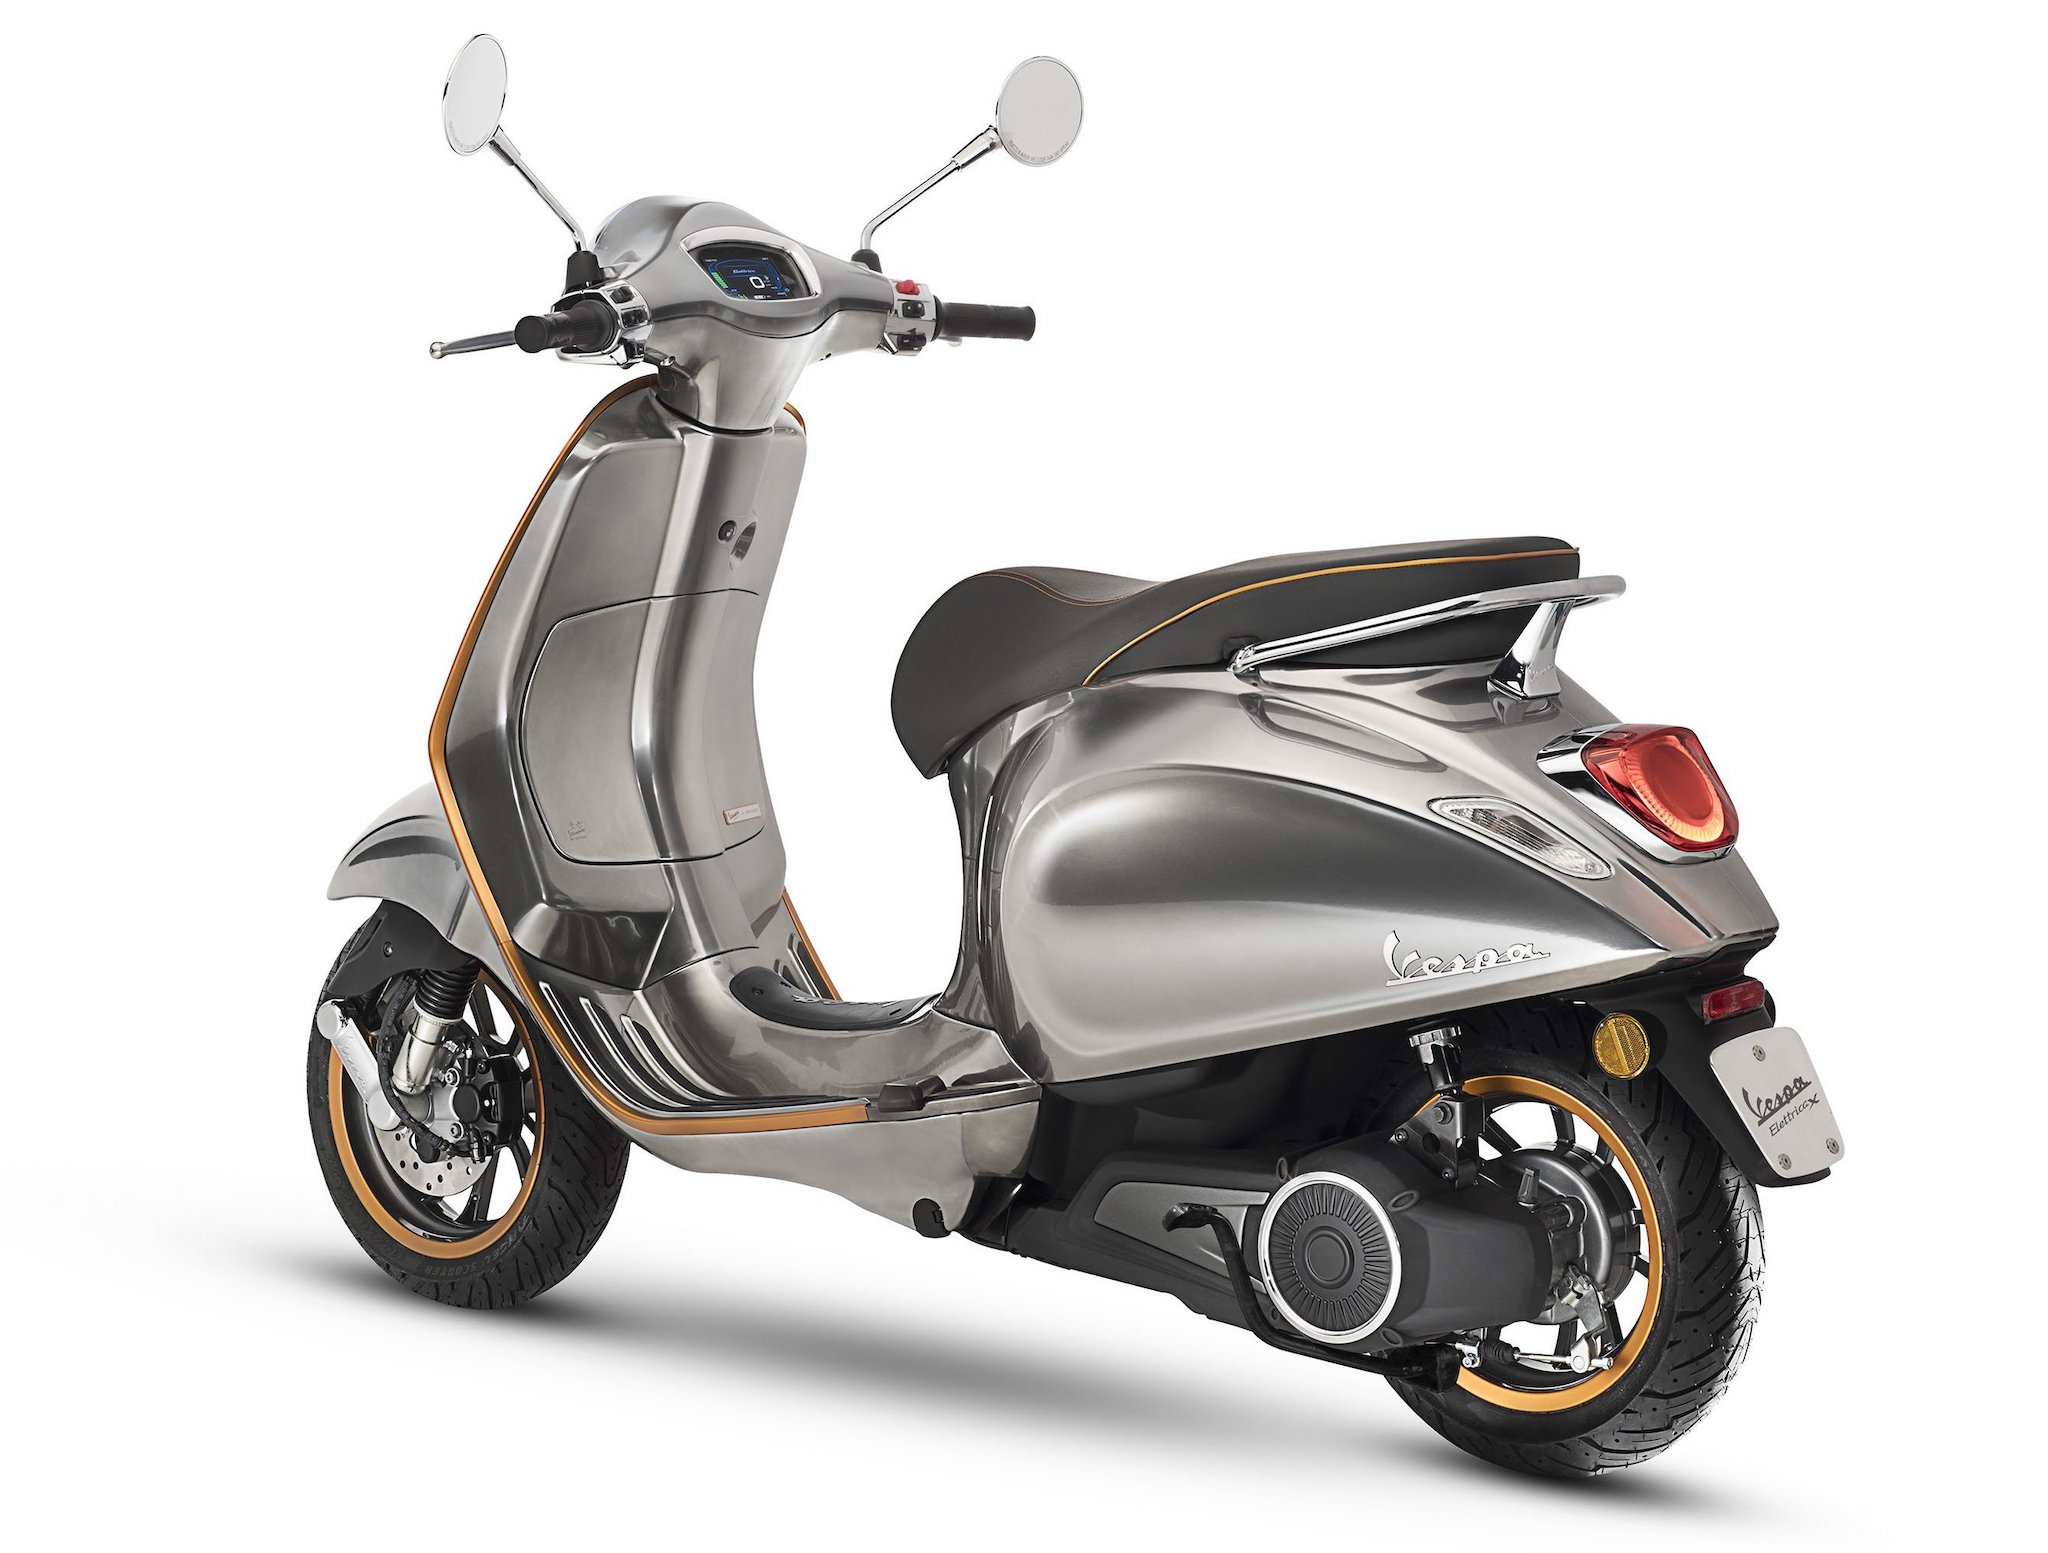 Vespa-Elettrica-e-scooter-rear-quarter.jpg